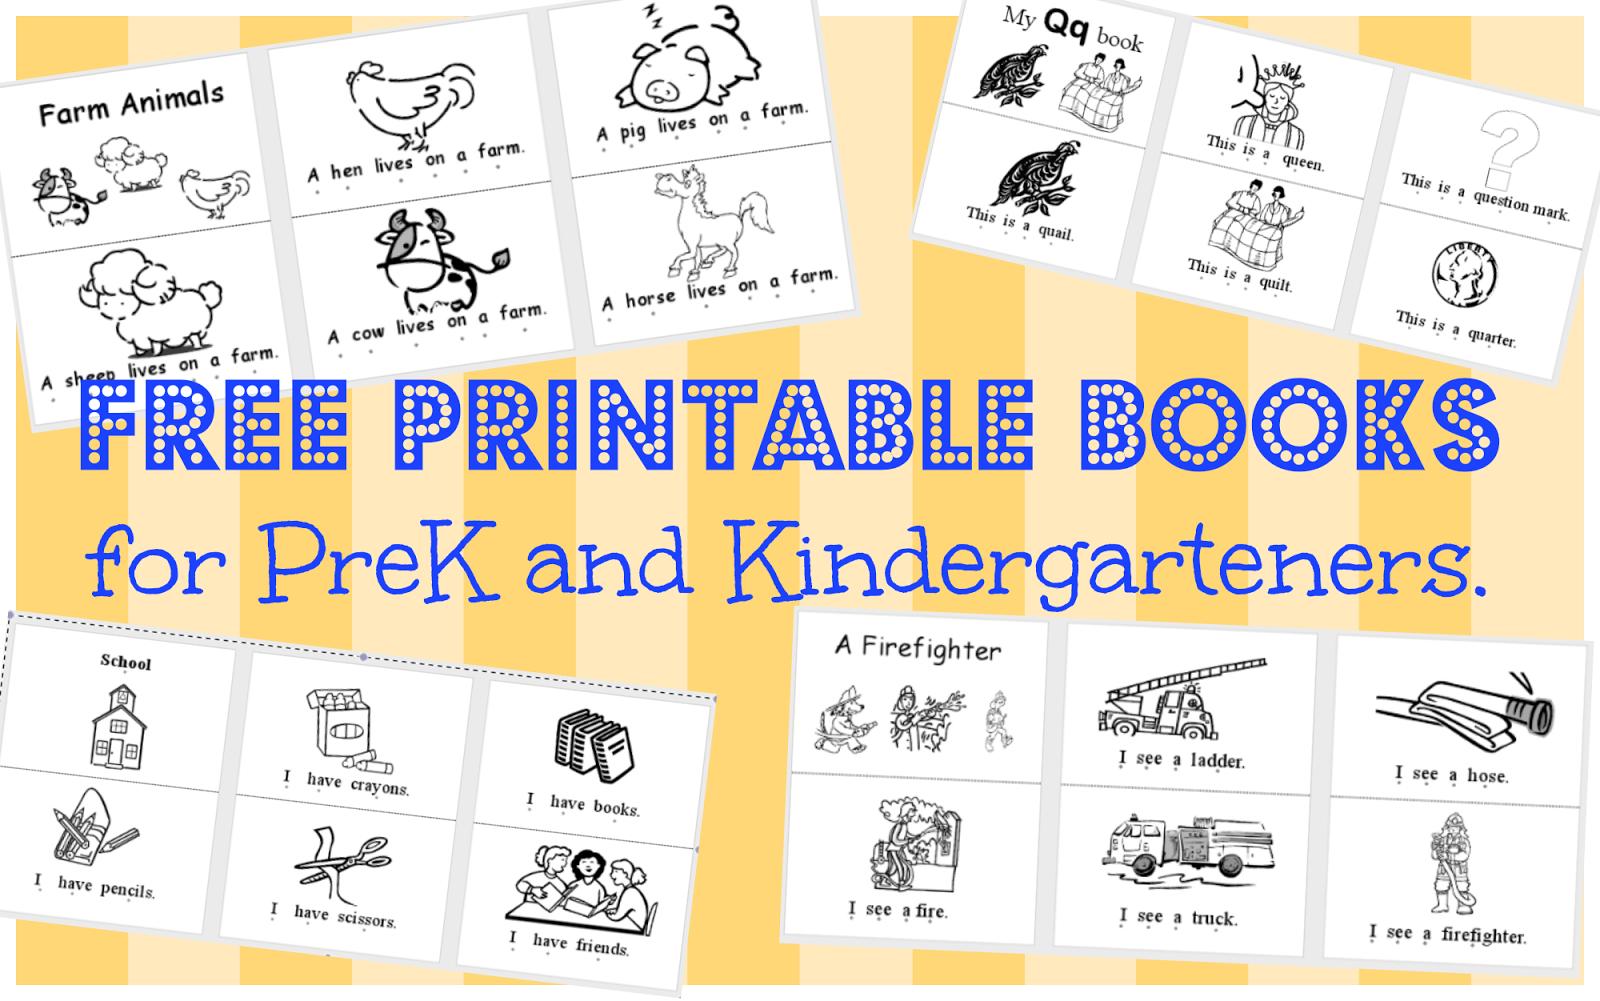 Printable Preschool Books Reading Free Printables Worksheet 1600 - Free Printable Reading Books For Preschool